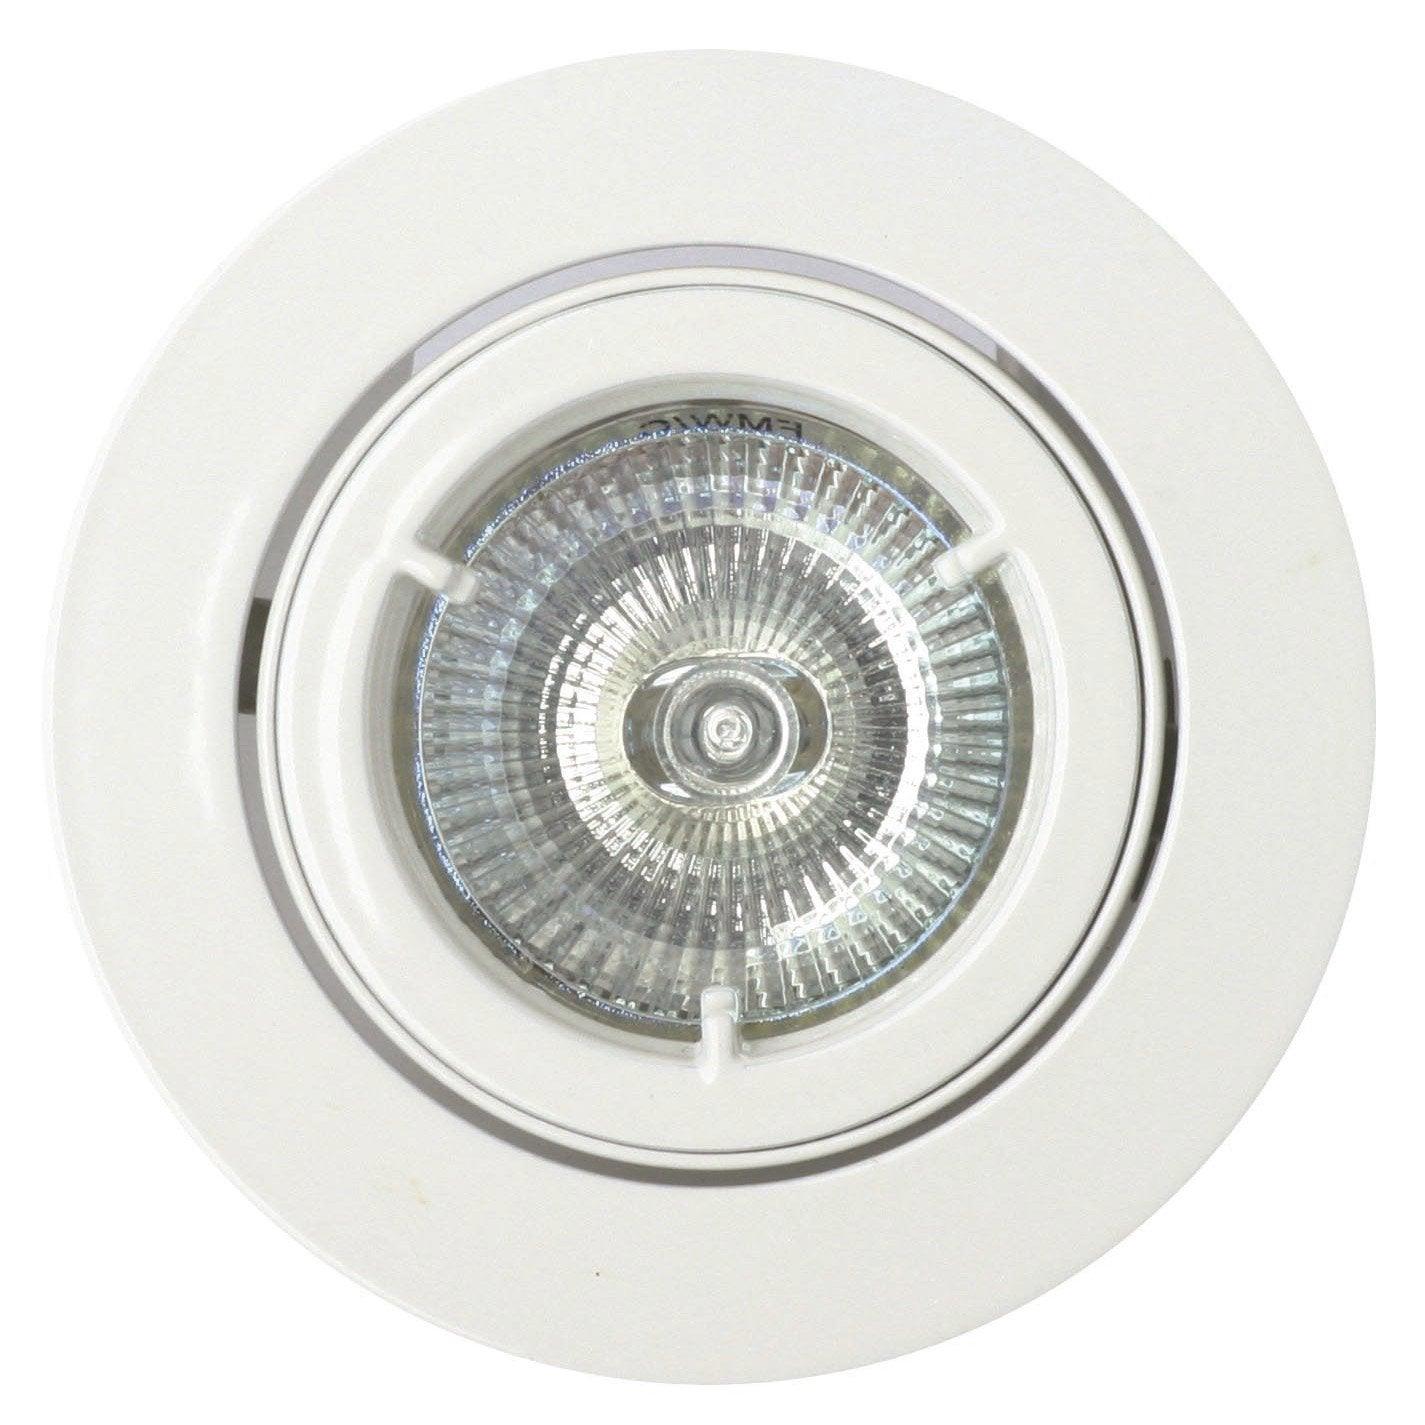 kit 1 spot encastrer salle de bains orientable halog ne inspire gu10 blanc leroy merlin. Black Bedroom Furniture Sets. Home Design Ideas